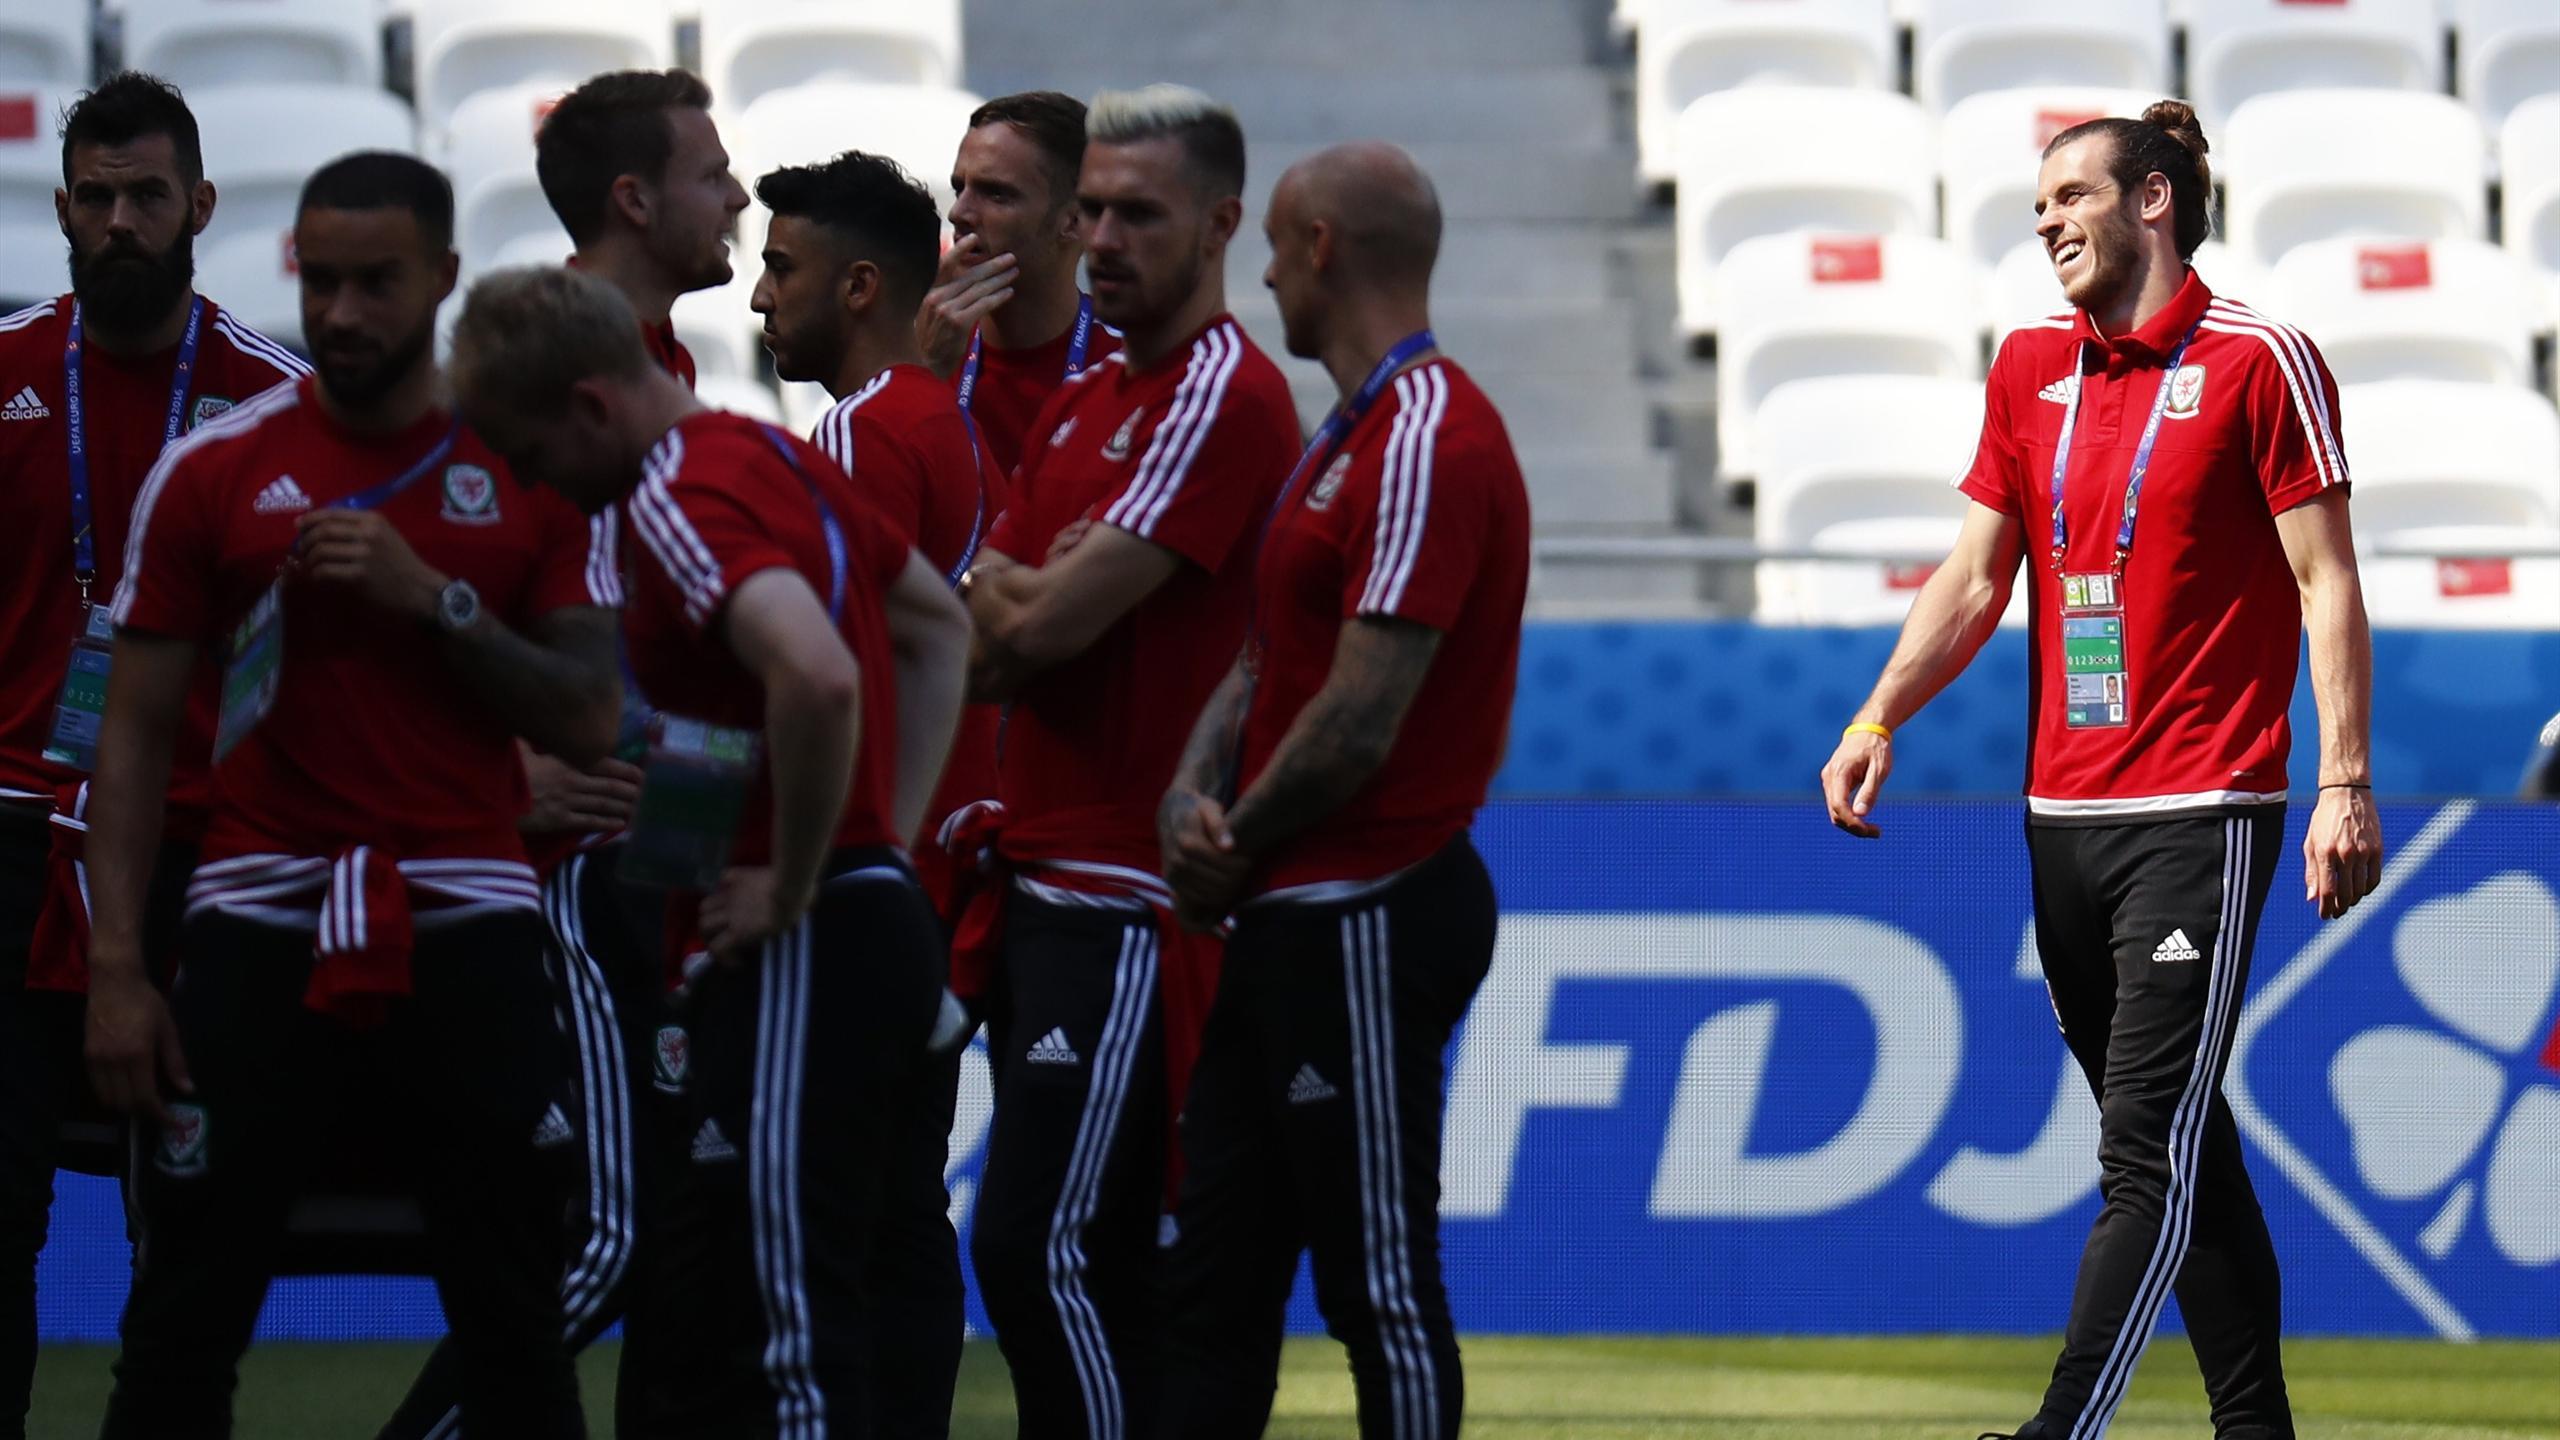 Gareth Bale cracks a smile